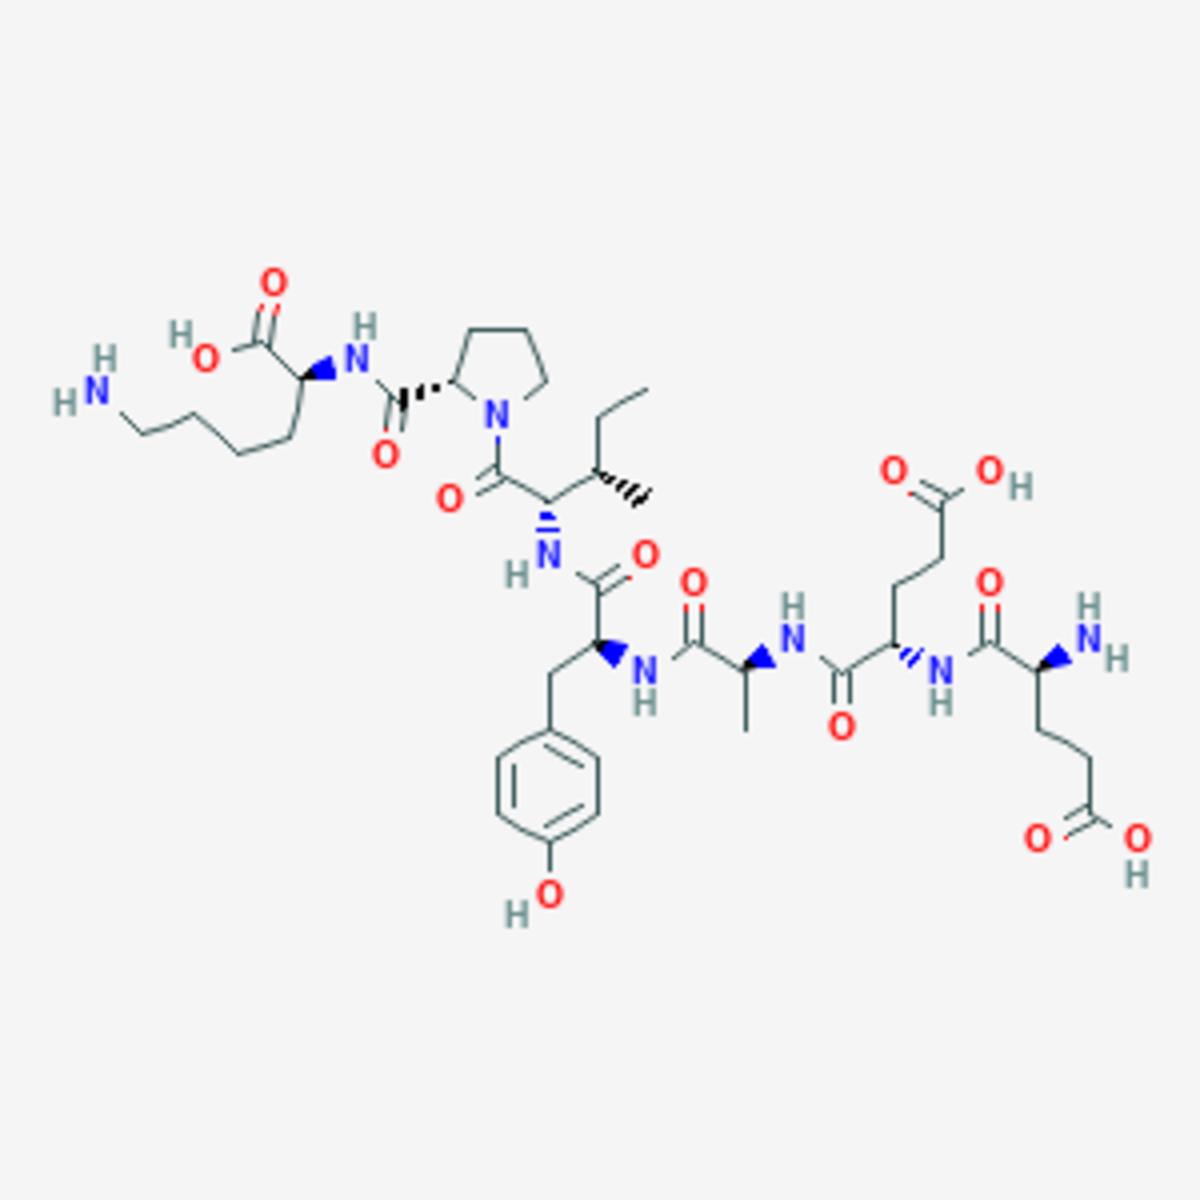 Molecular set up of Human Growth Hormone